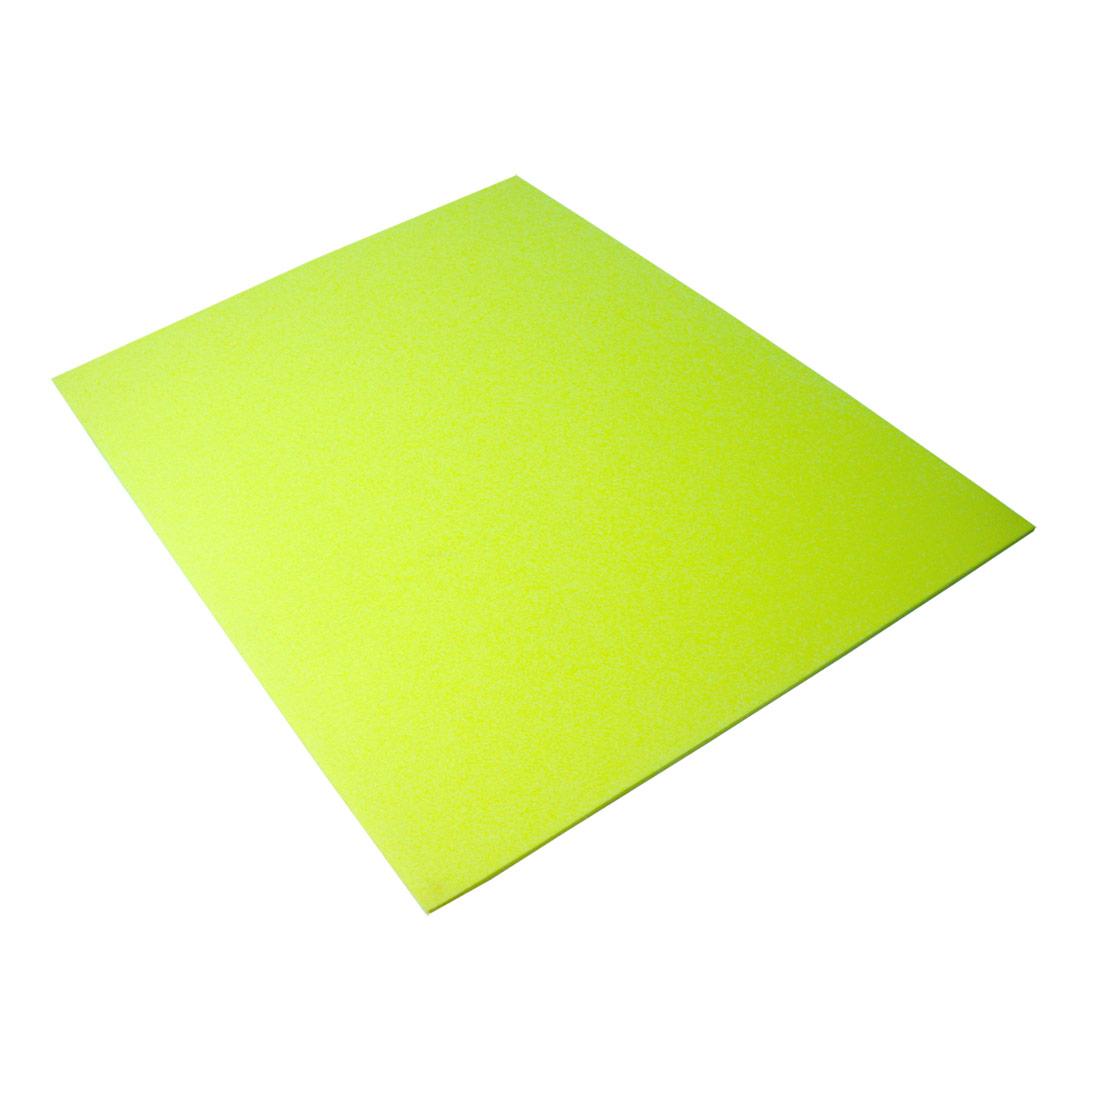 Non-slip Pad with Adhesive Bottom - Yellow